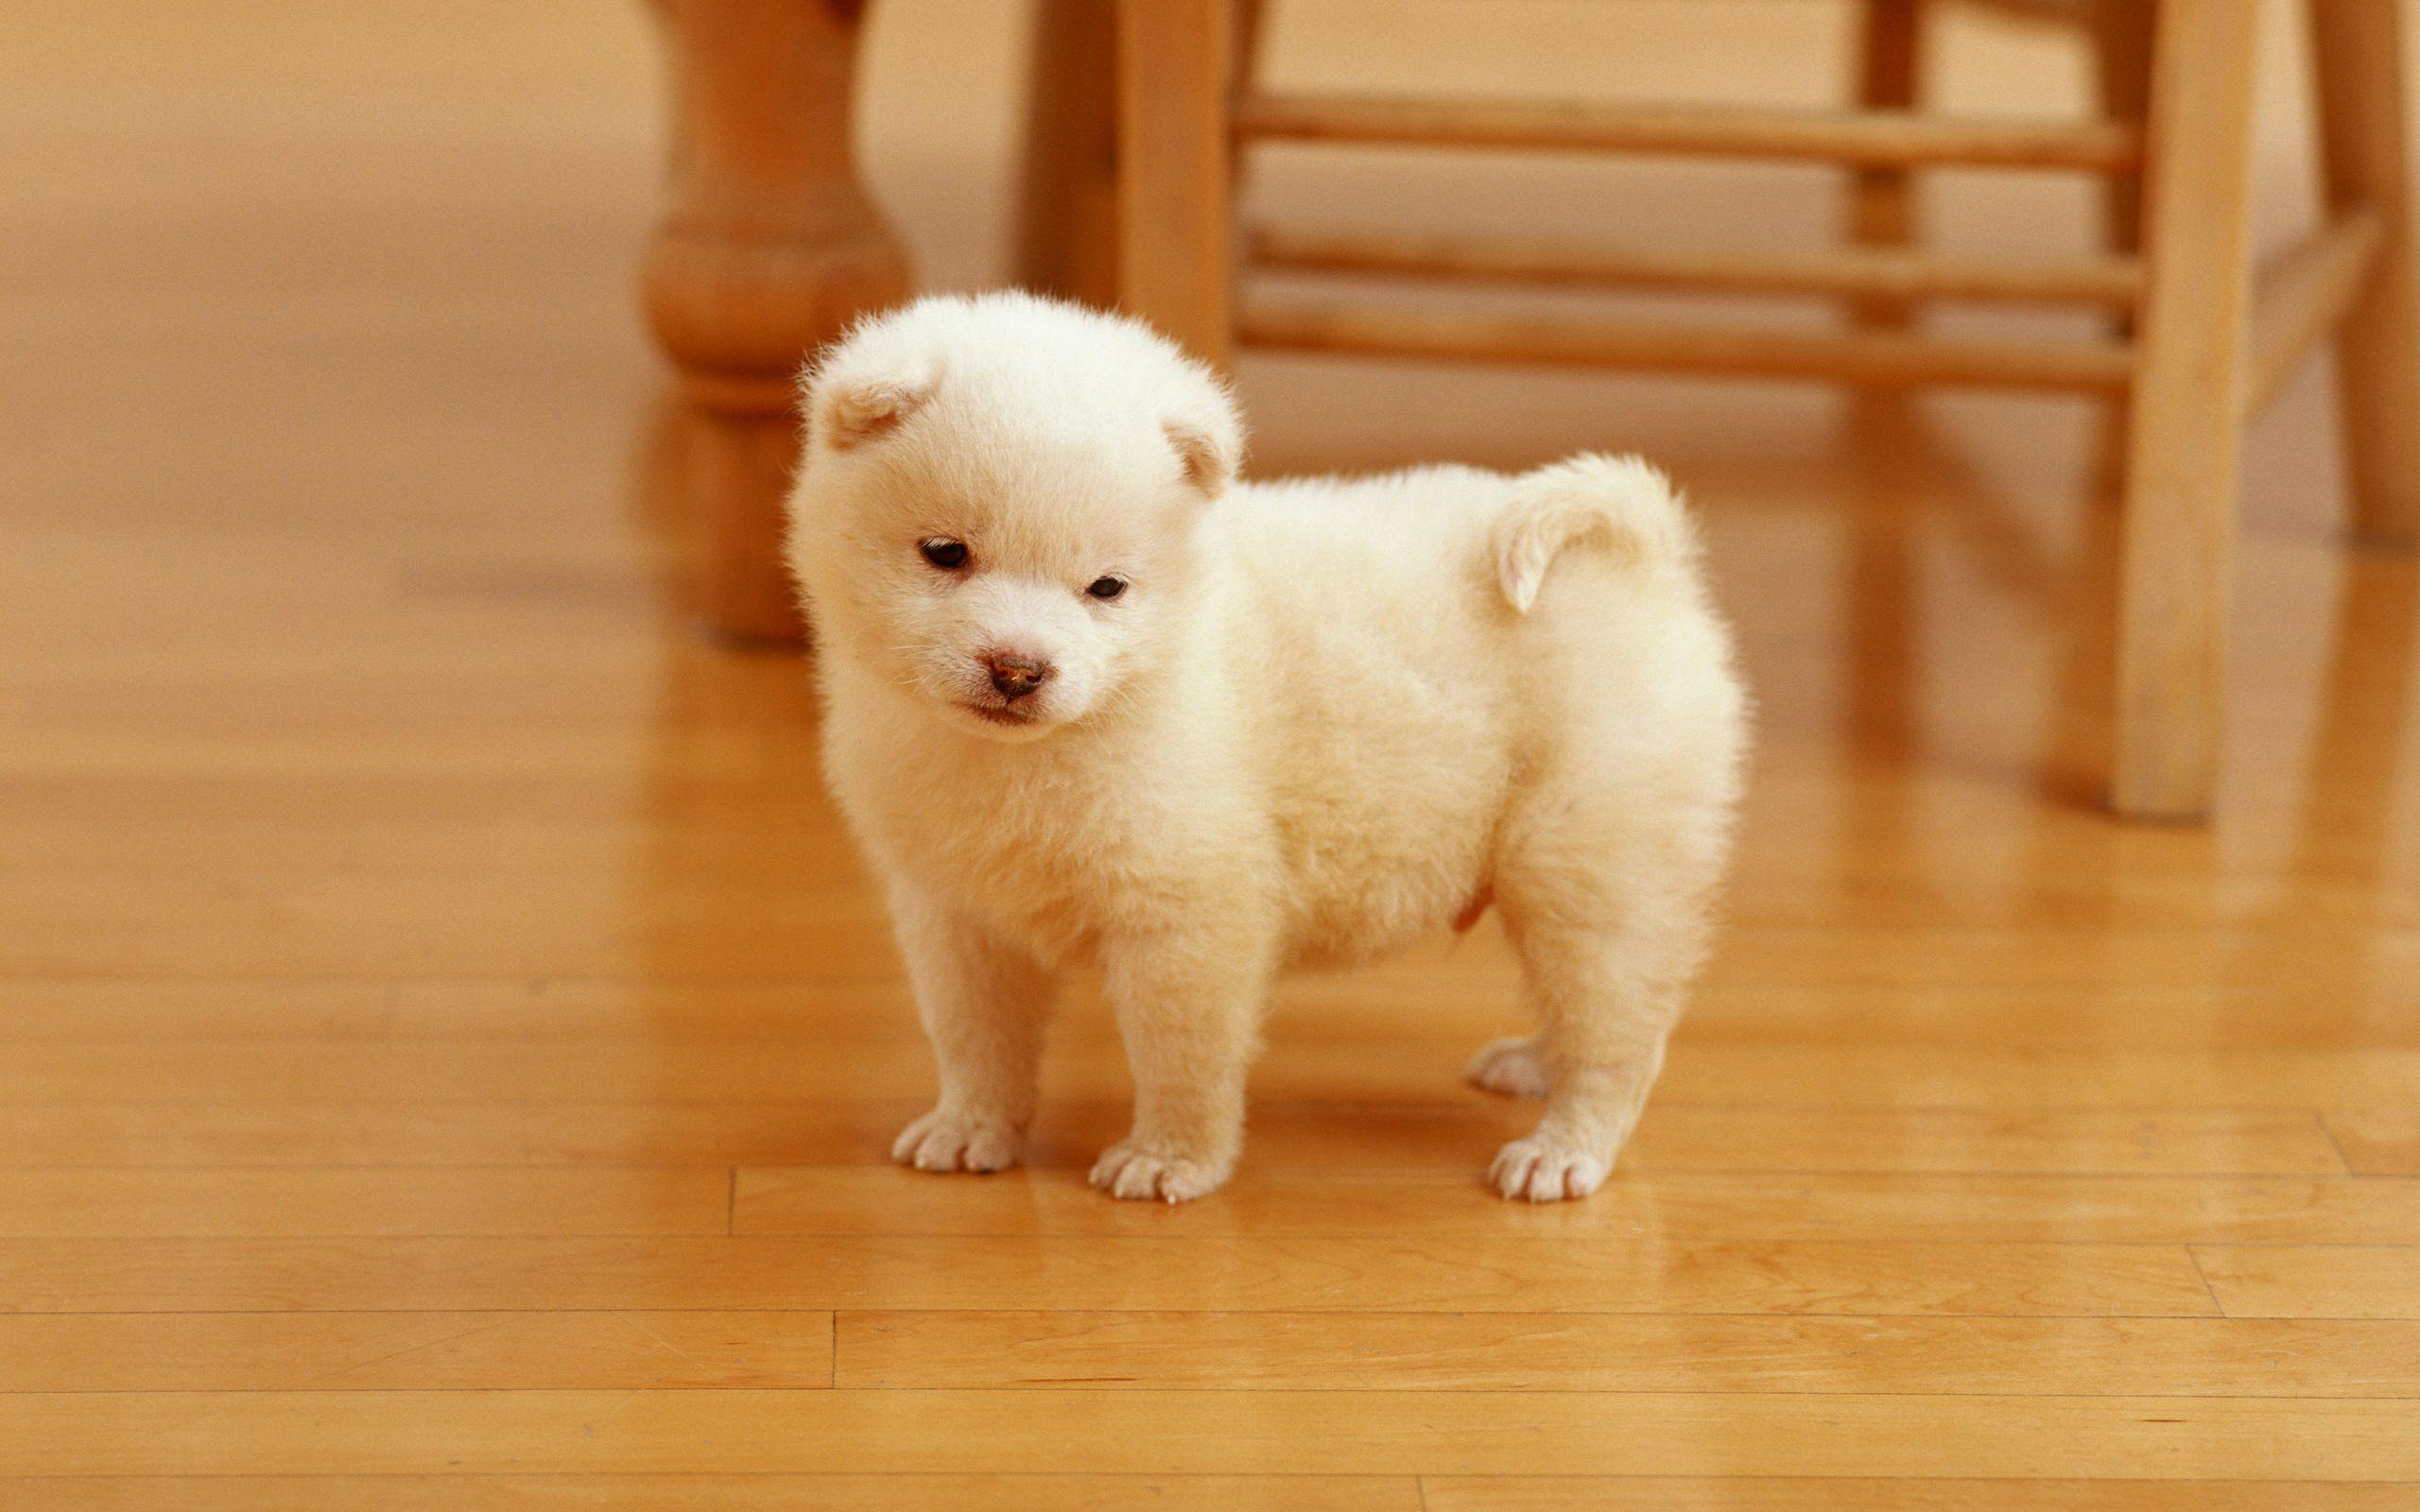 White Cute Puppy 2560x1600 Wallpaper Very Cute Puppies Cute Dogs Puppies Cute Dog Wallpaper